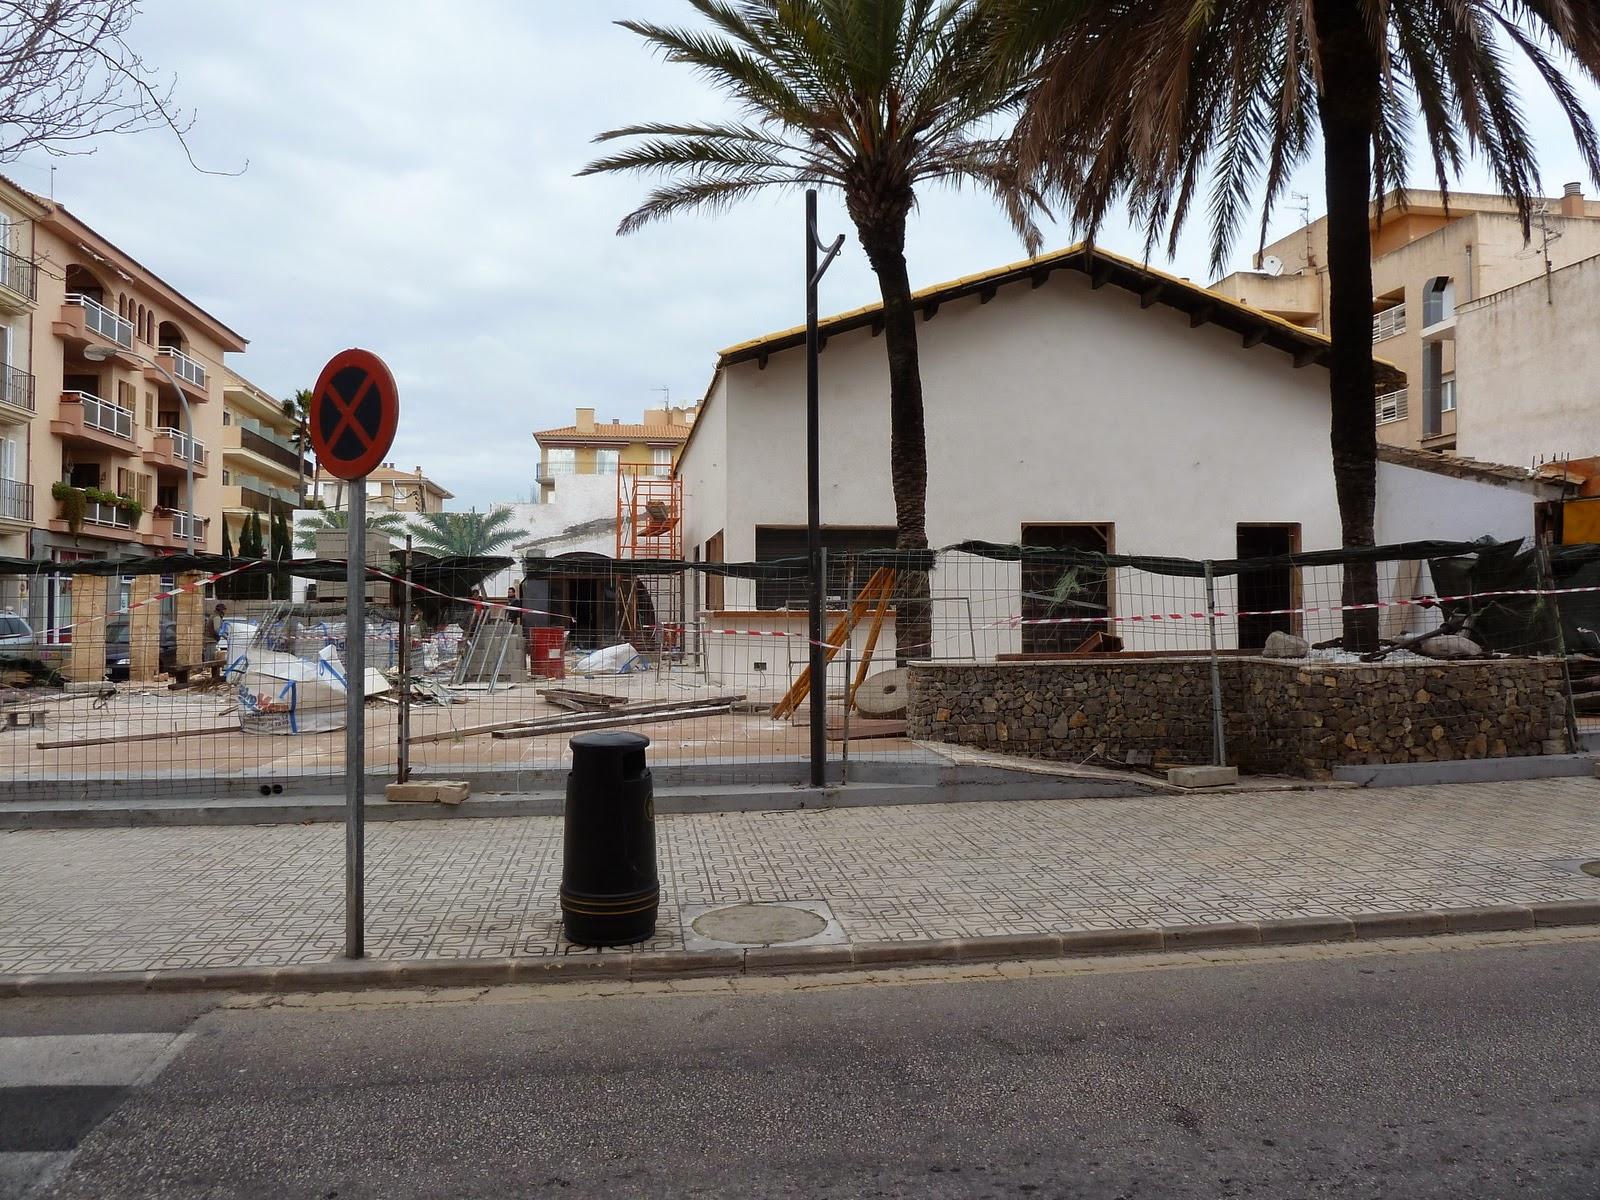 220 Berwintern Auf Mallorca Cala Ratjada Was Tut Sich Auf